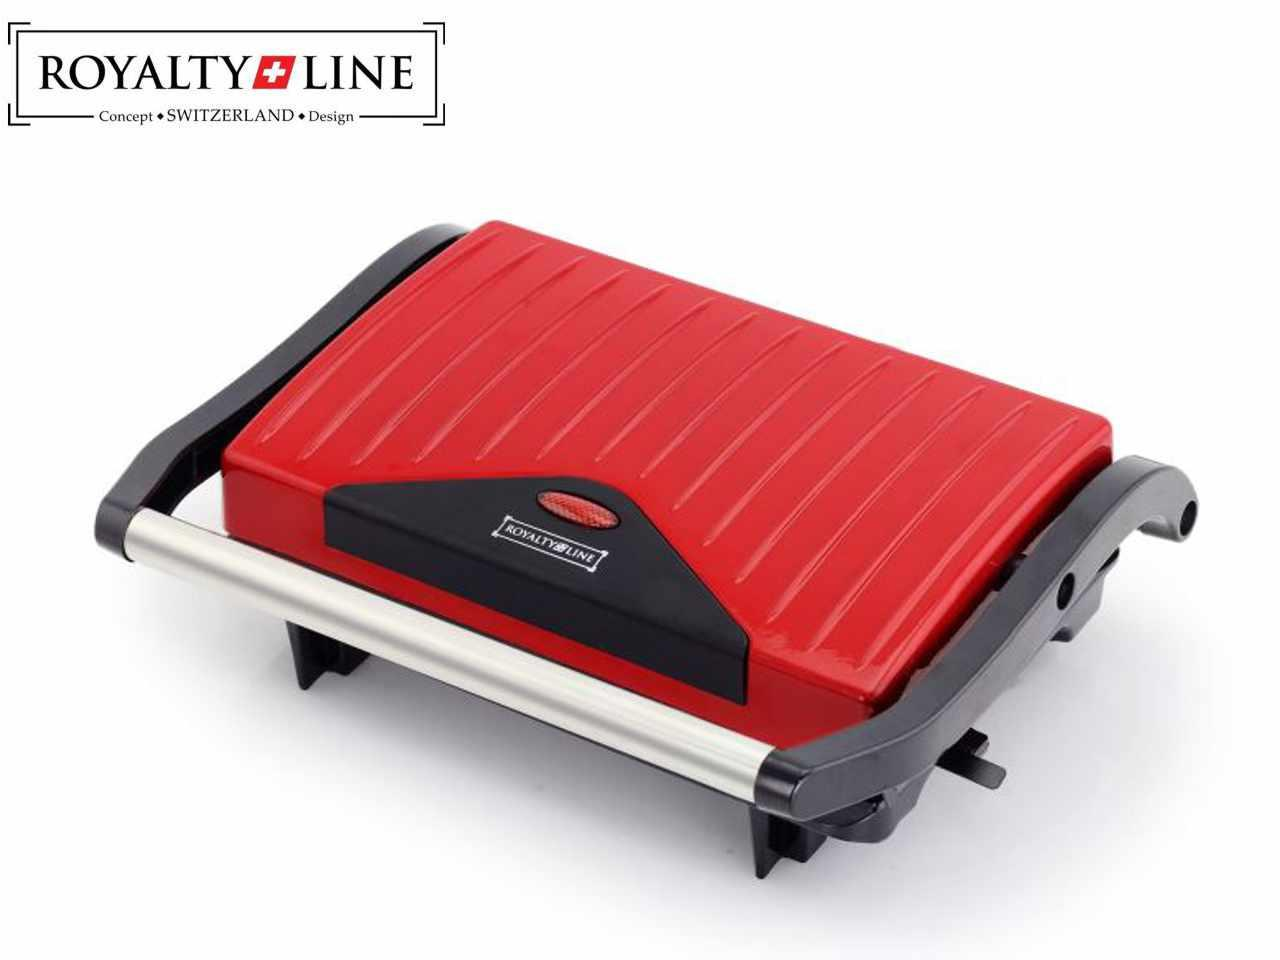 ROYALTY LINE RL-PM-750.1 RED